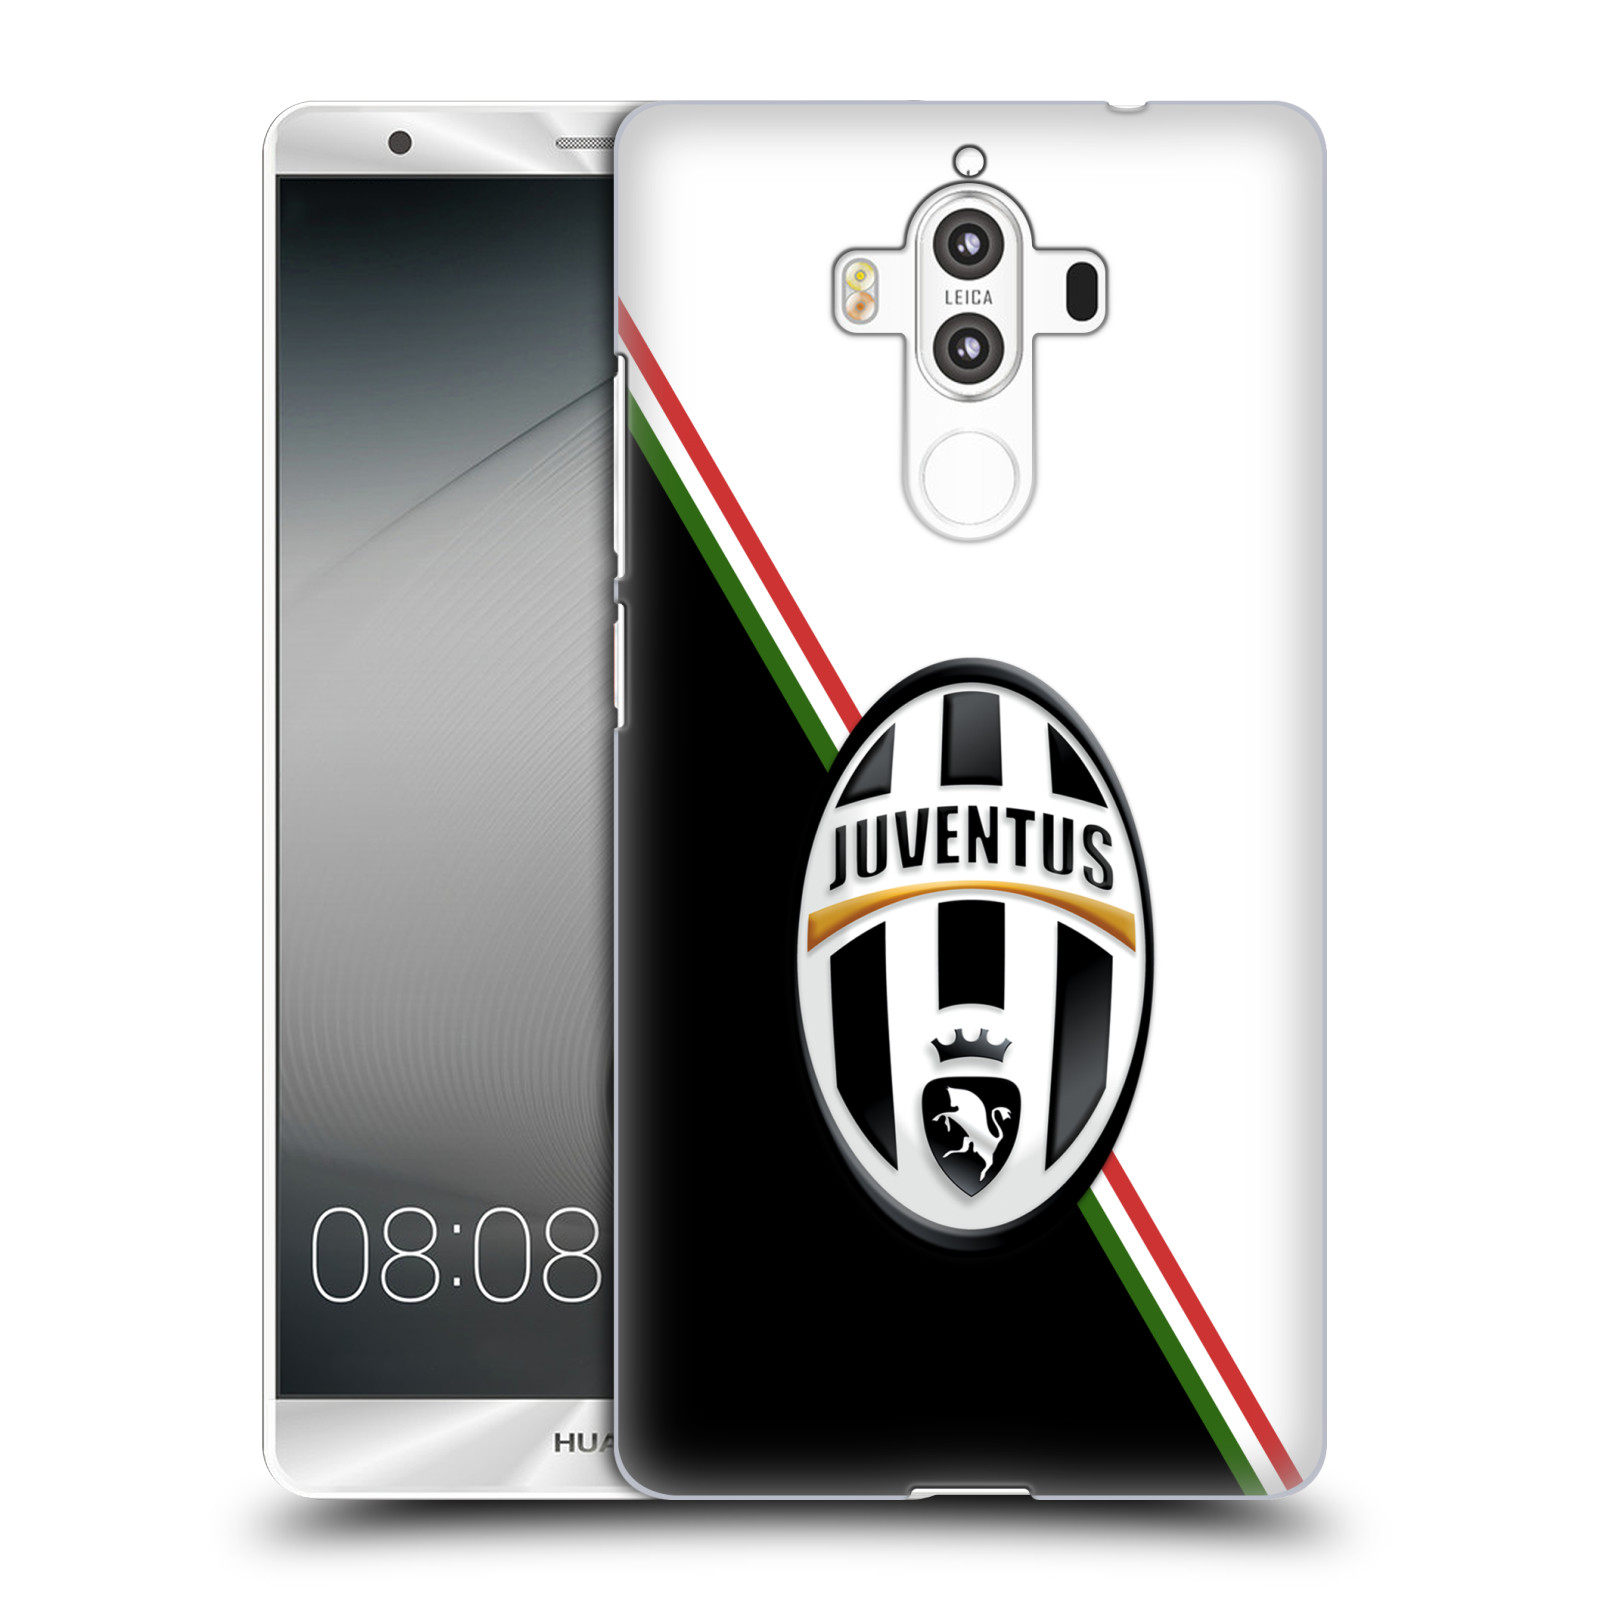 Plastové pouzdro na mobil Huawei Mate 9 - Head Case Juventus FC - Black and White (Plastový kryt či obal na mobilní telefon Juventus FC Official pro Huawei Mate 9 (Dual SIM))